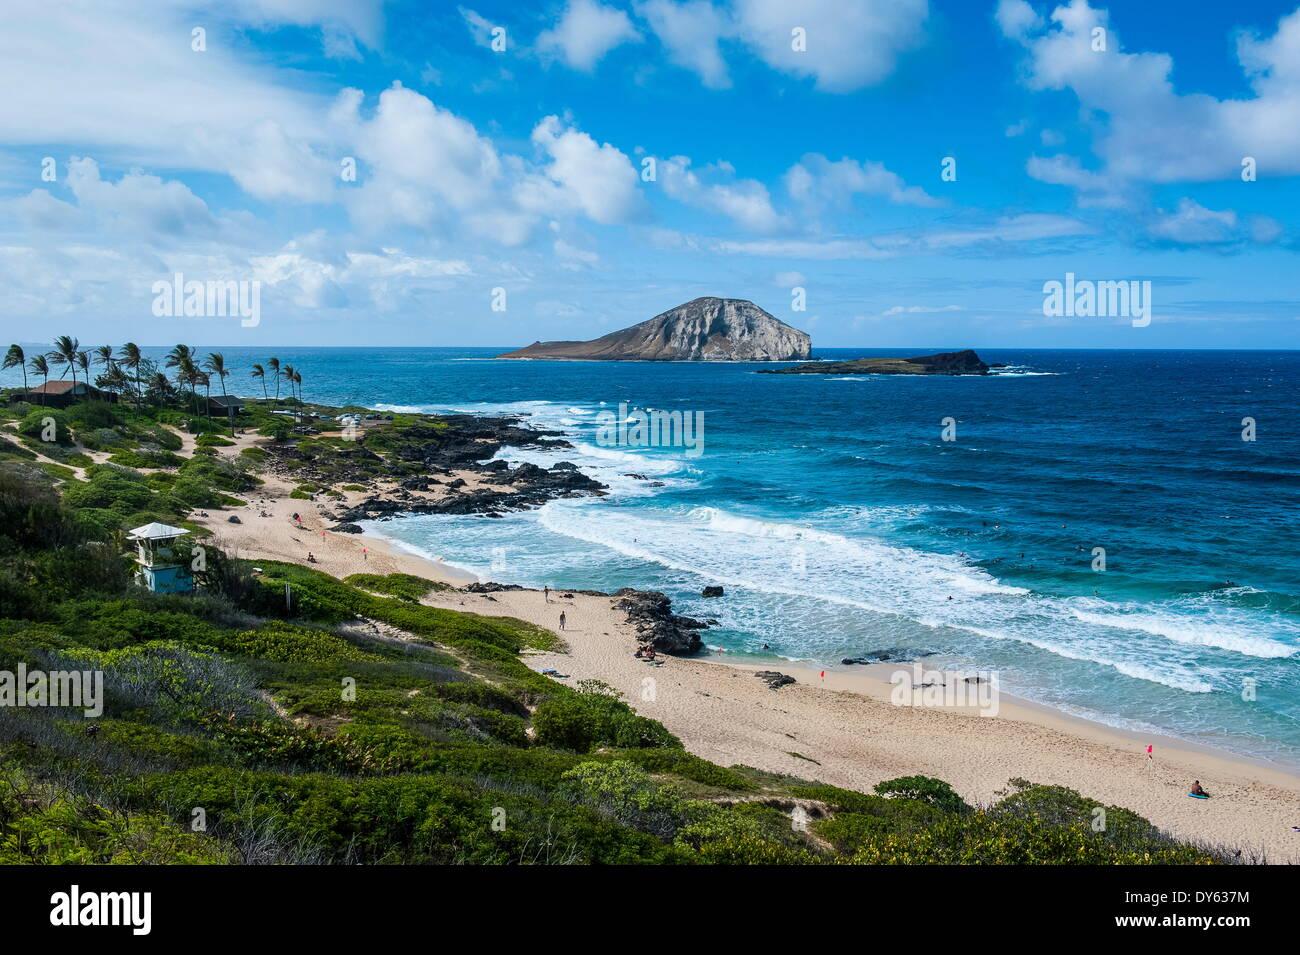 Kaohikaipu Island and Kaupo Beach, Oahu, Hawaii, United States of America, Pacific - Stock Image